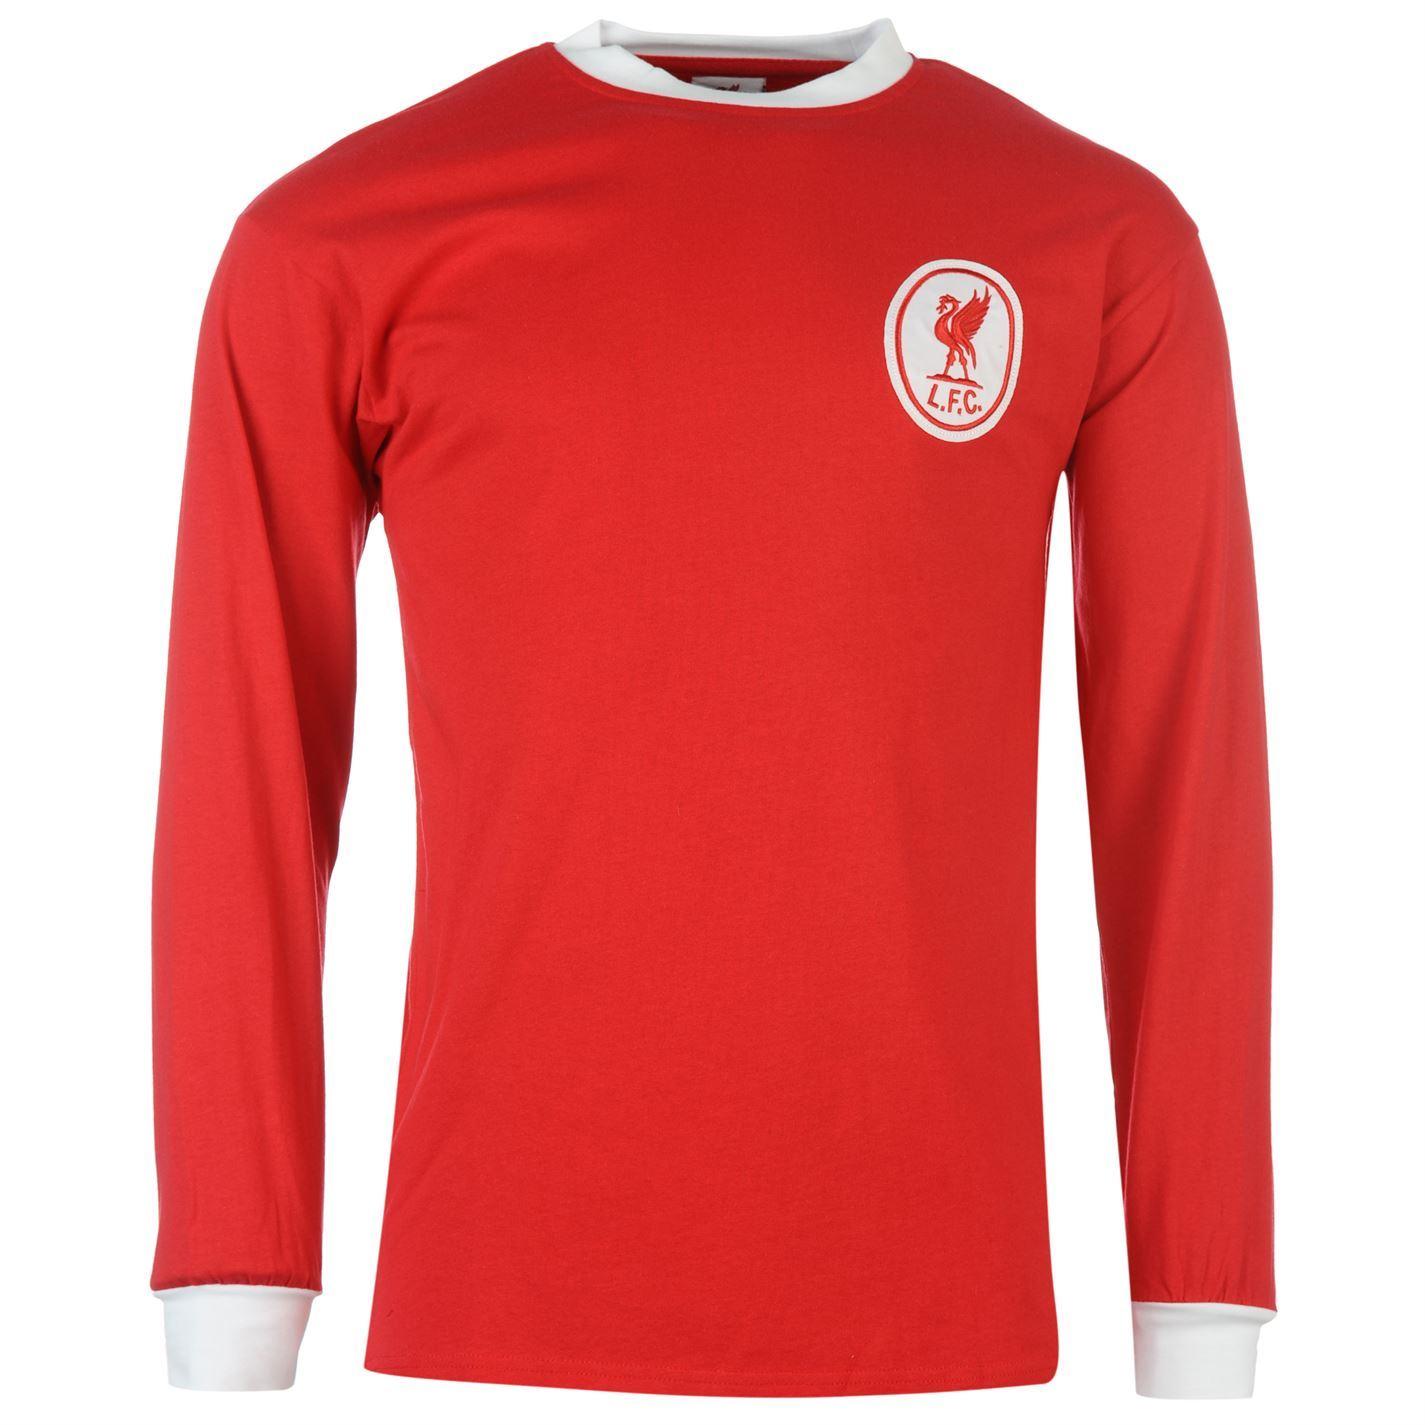 Liverpool Fc  Home Jersey Score Draw Mens Redwht Retro Football